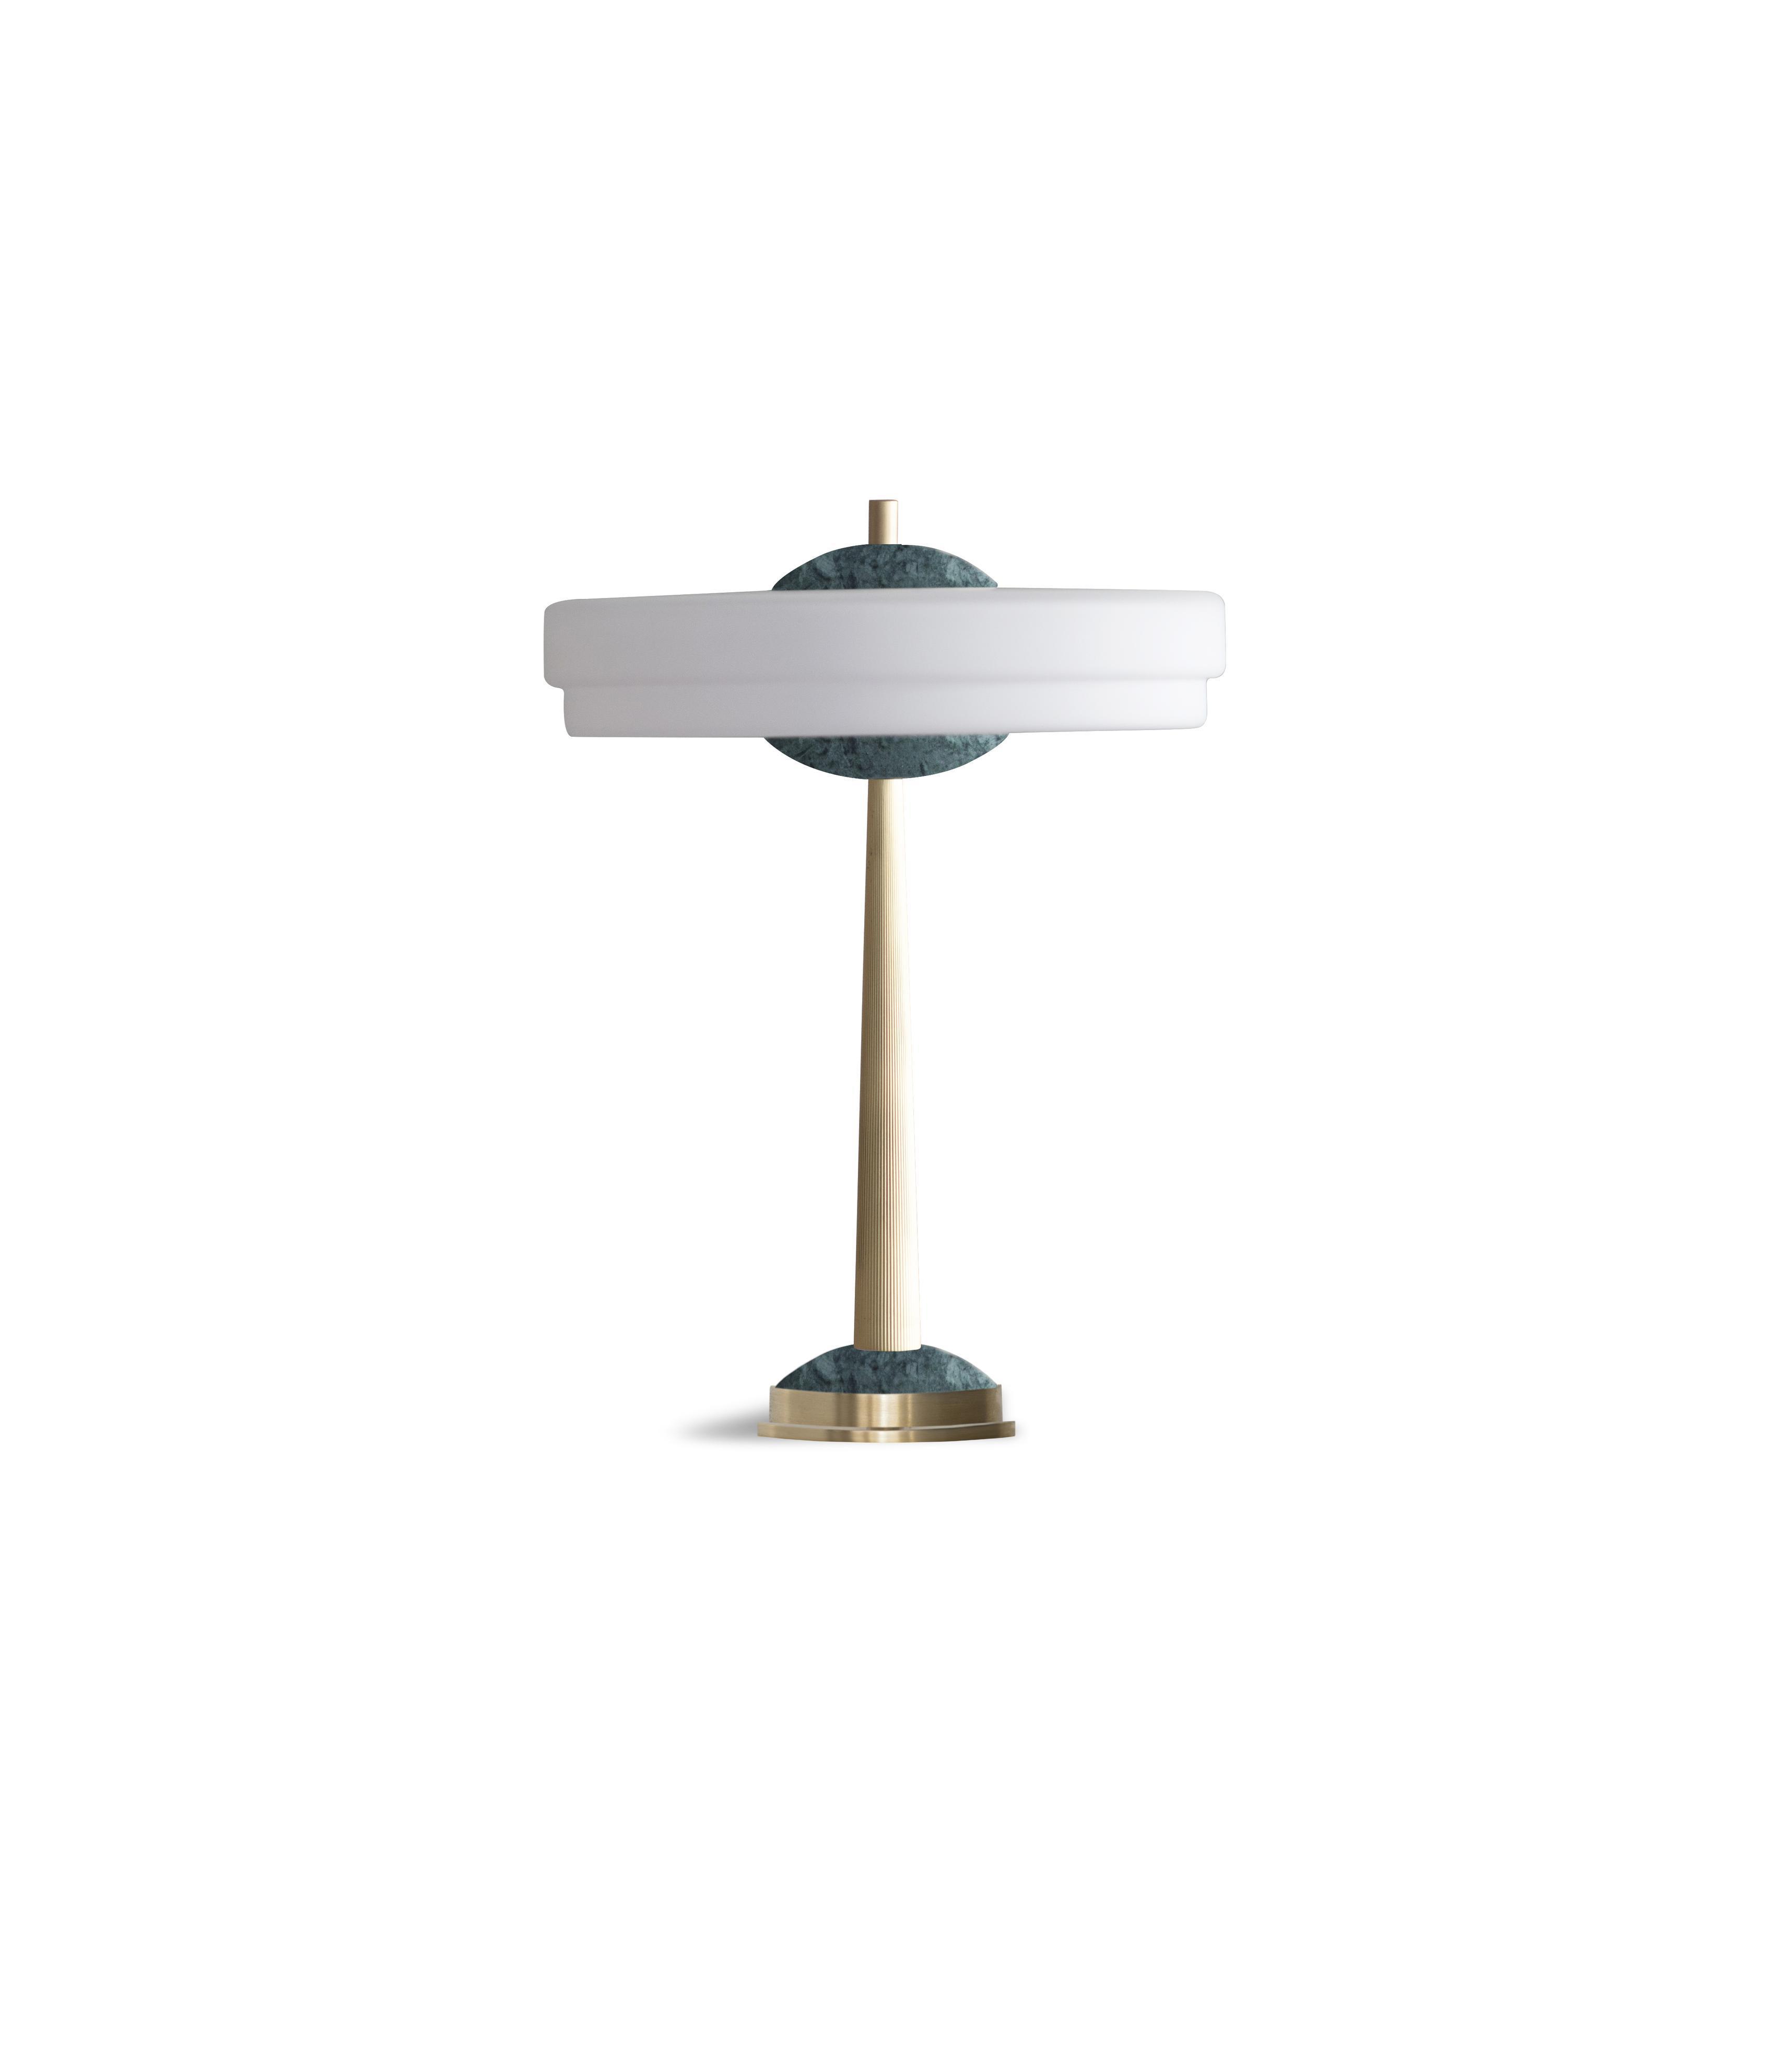 Bertfrank (RU) Настольная лампа Trave от английского бренда Bert Frank